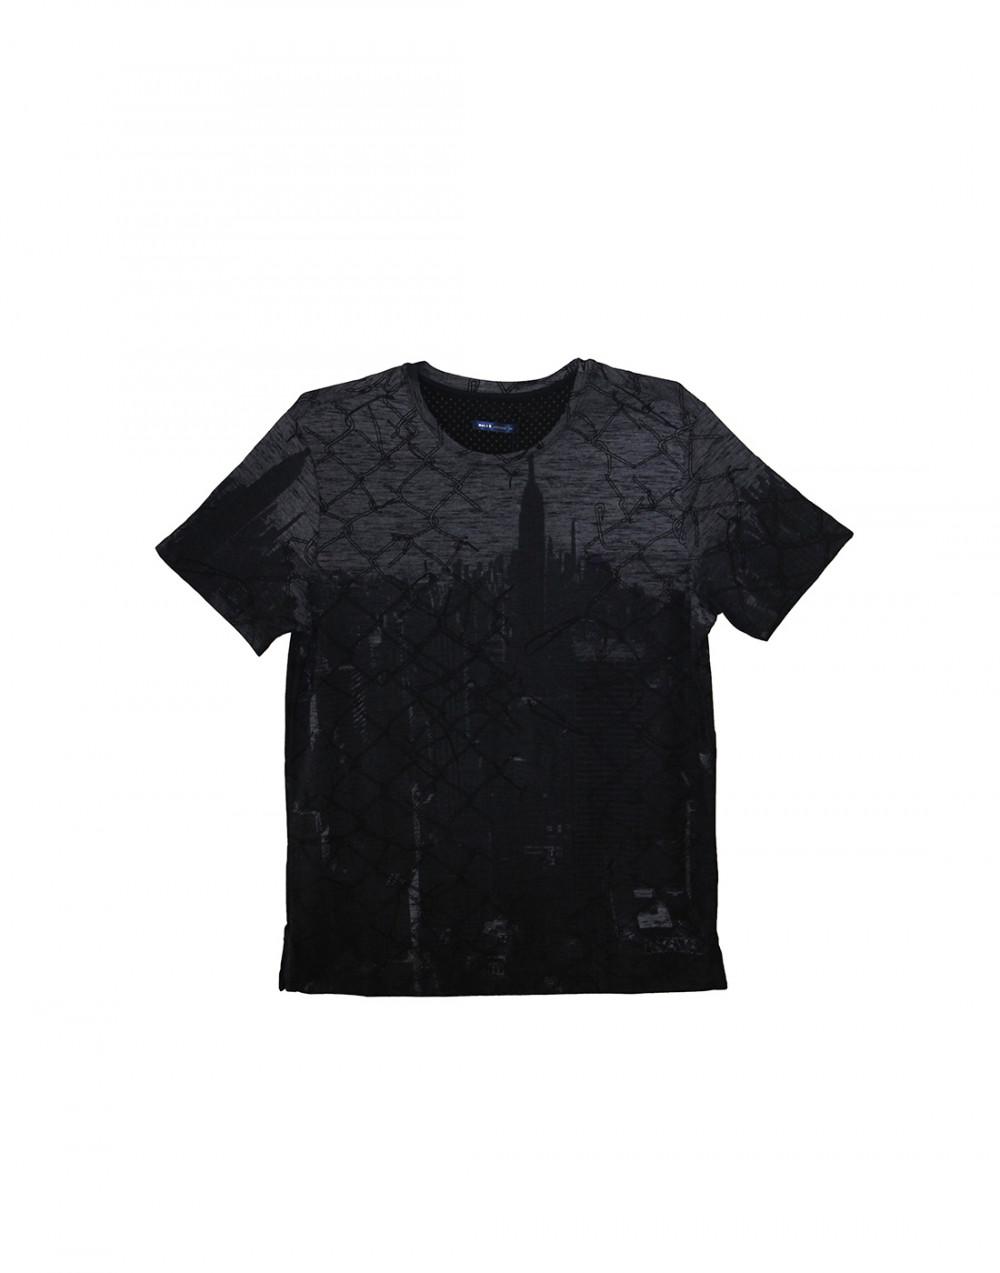 Camiseta Gola O. Estampada Marinho Sallo